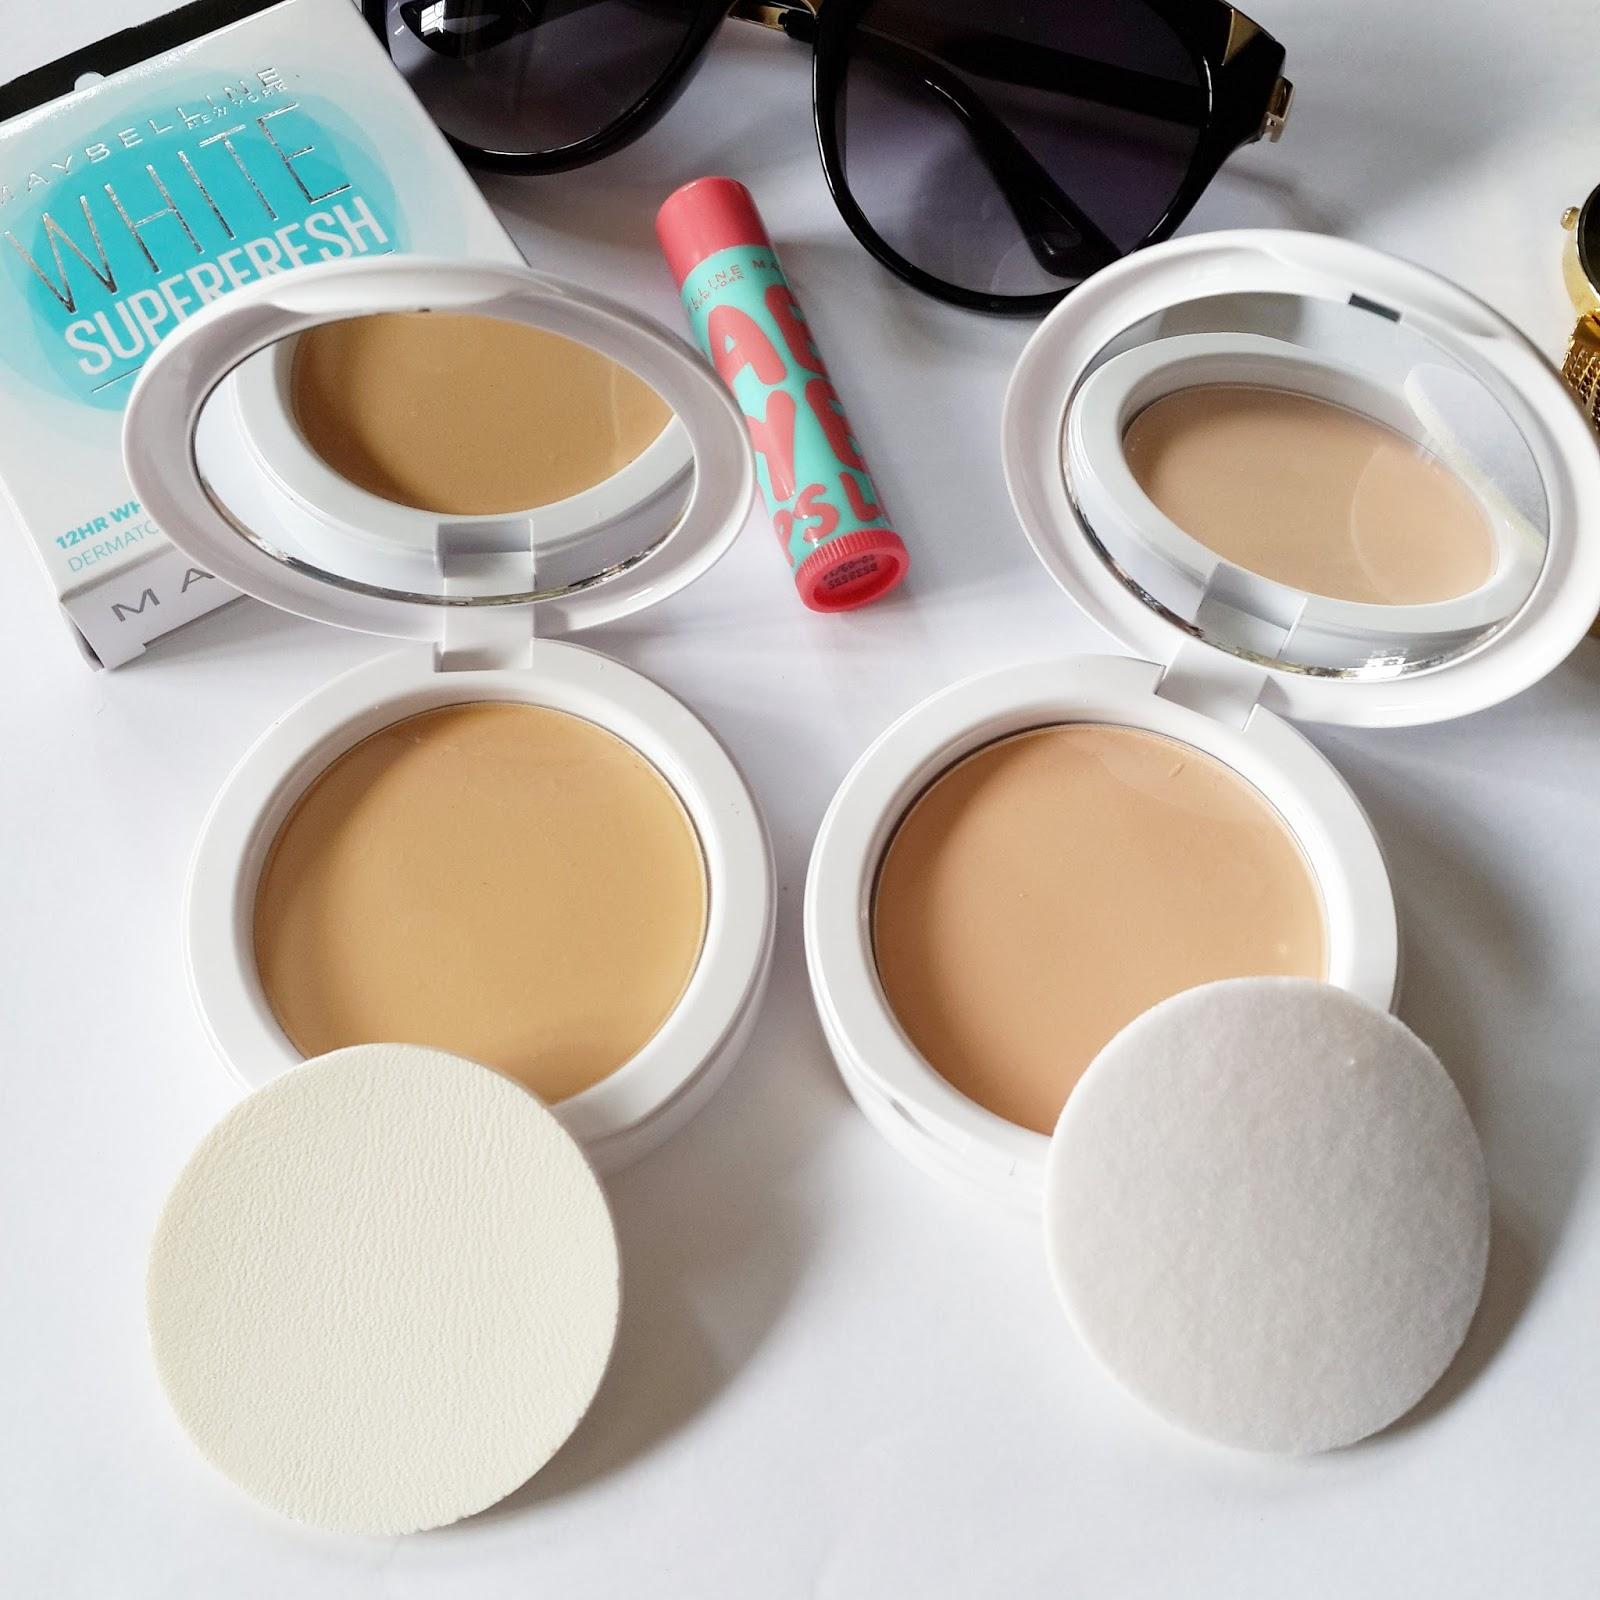 Ridzi Makeup Compact Maybelline Two Cake Bedak 2 Pcs L Shell R Pearl